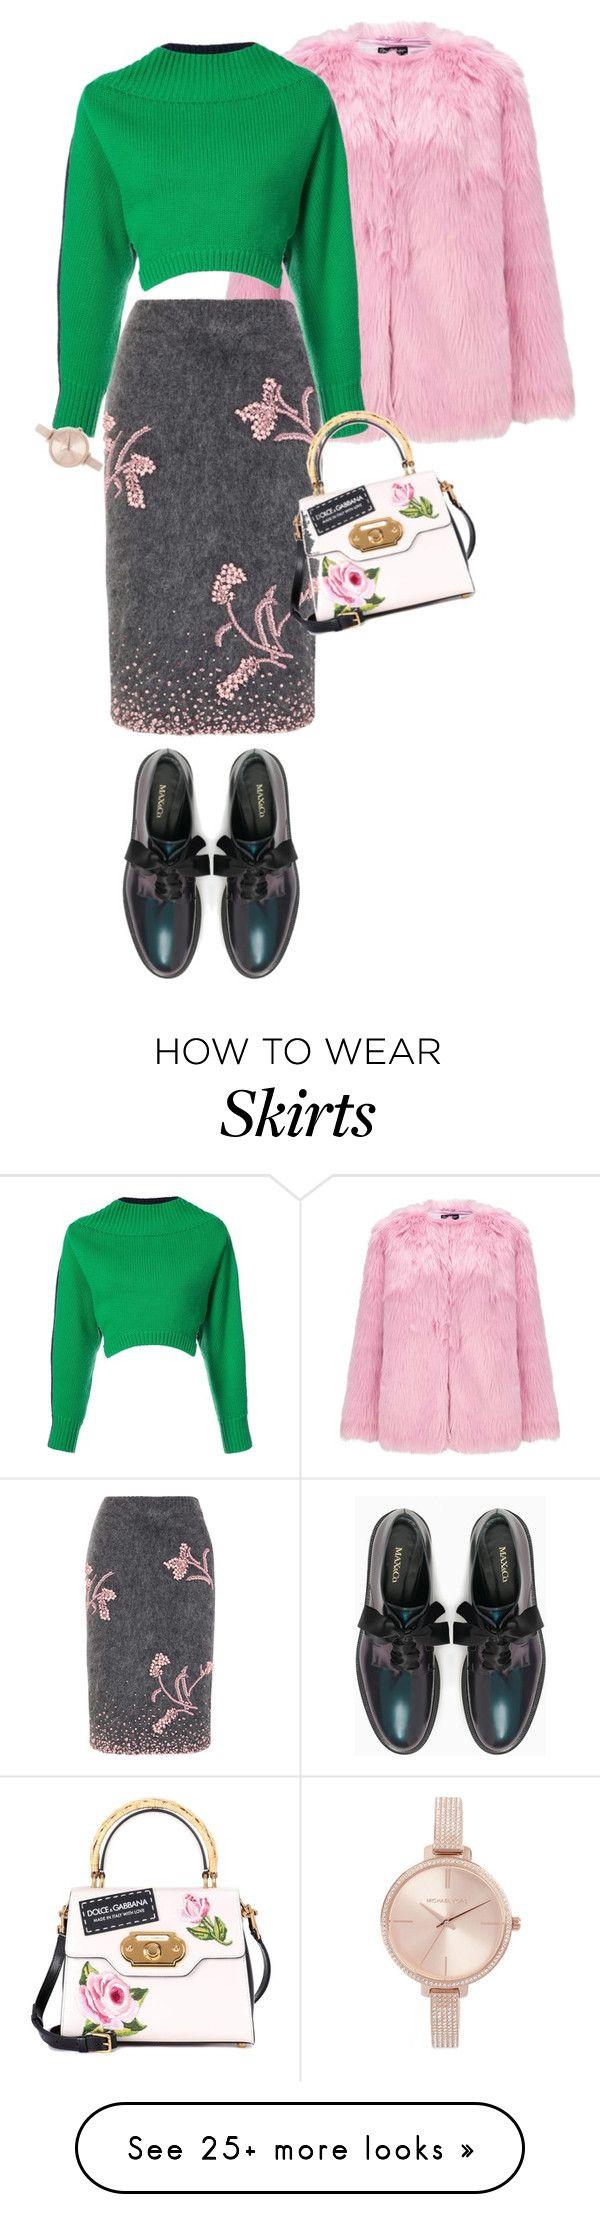 """how to wear: pencil skirt"" by missgirlgiuli on Polyvore featuring Miss Selfridge, Prada, Monse, Max&Co., Michael Kors and Dolce&Gabbana"